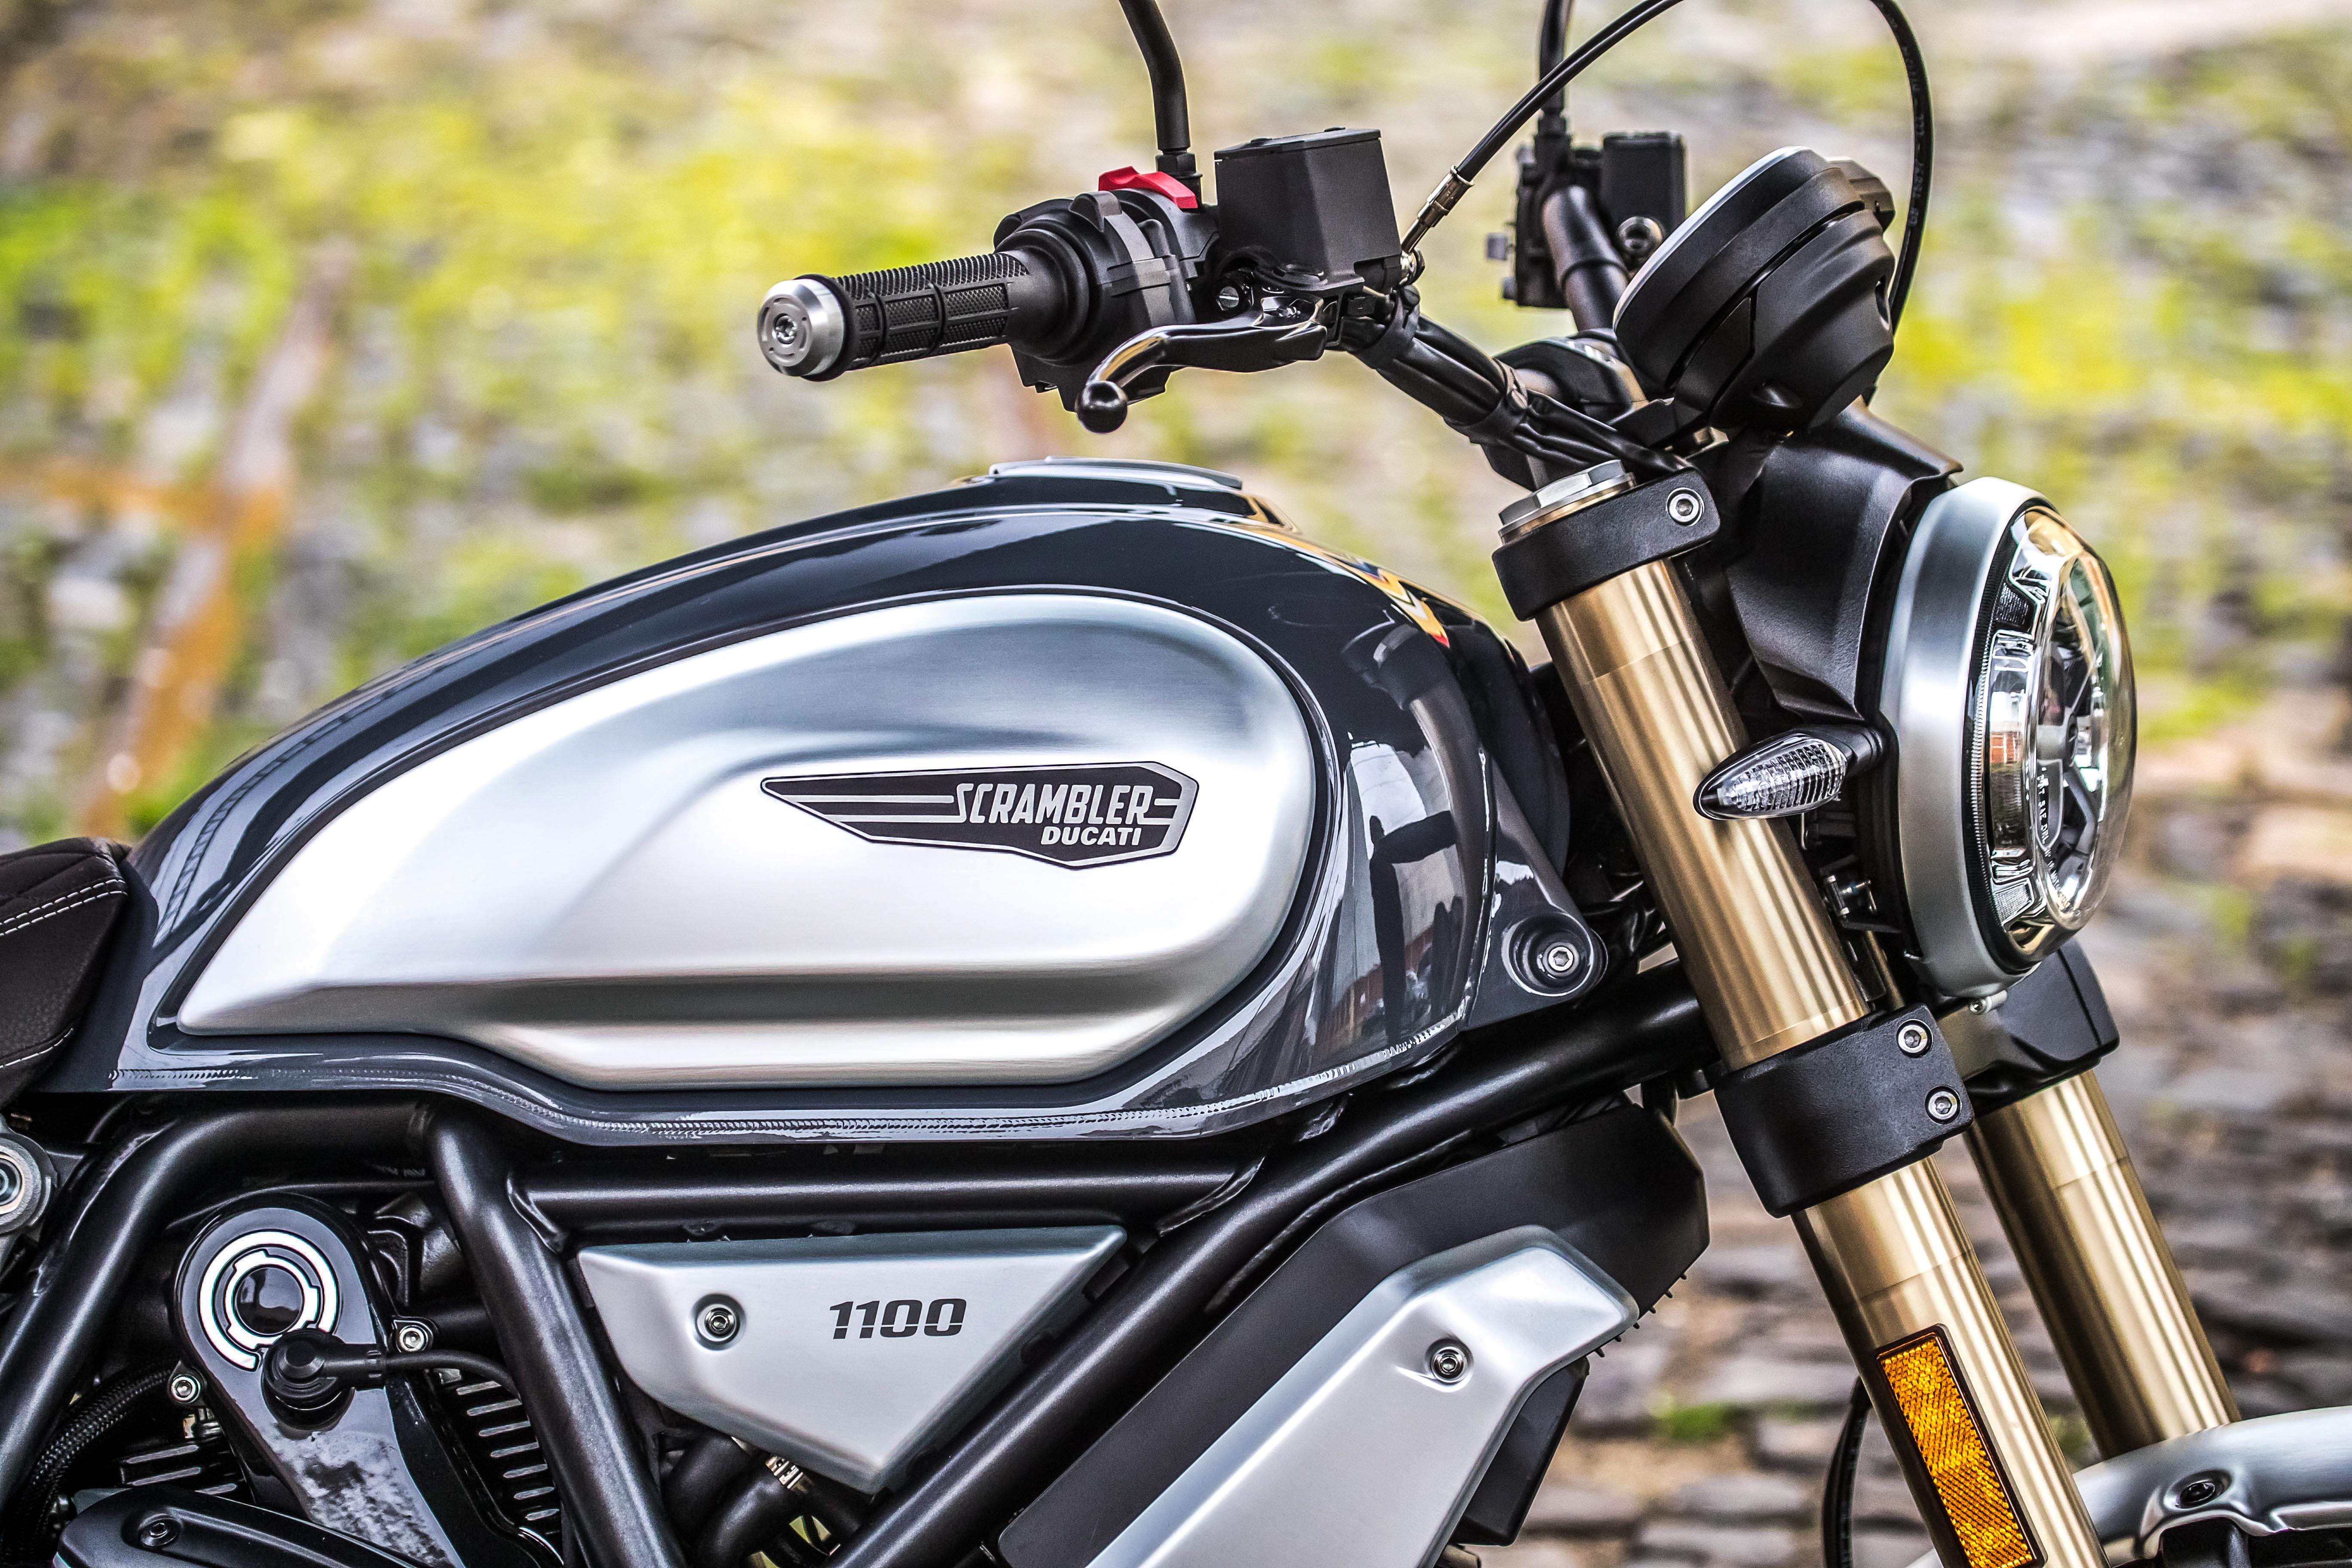 Bikes The New Ducati Scrambler 1100 Arrives In Malaysia Prices